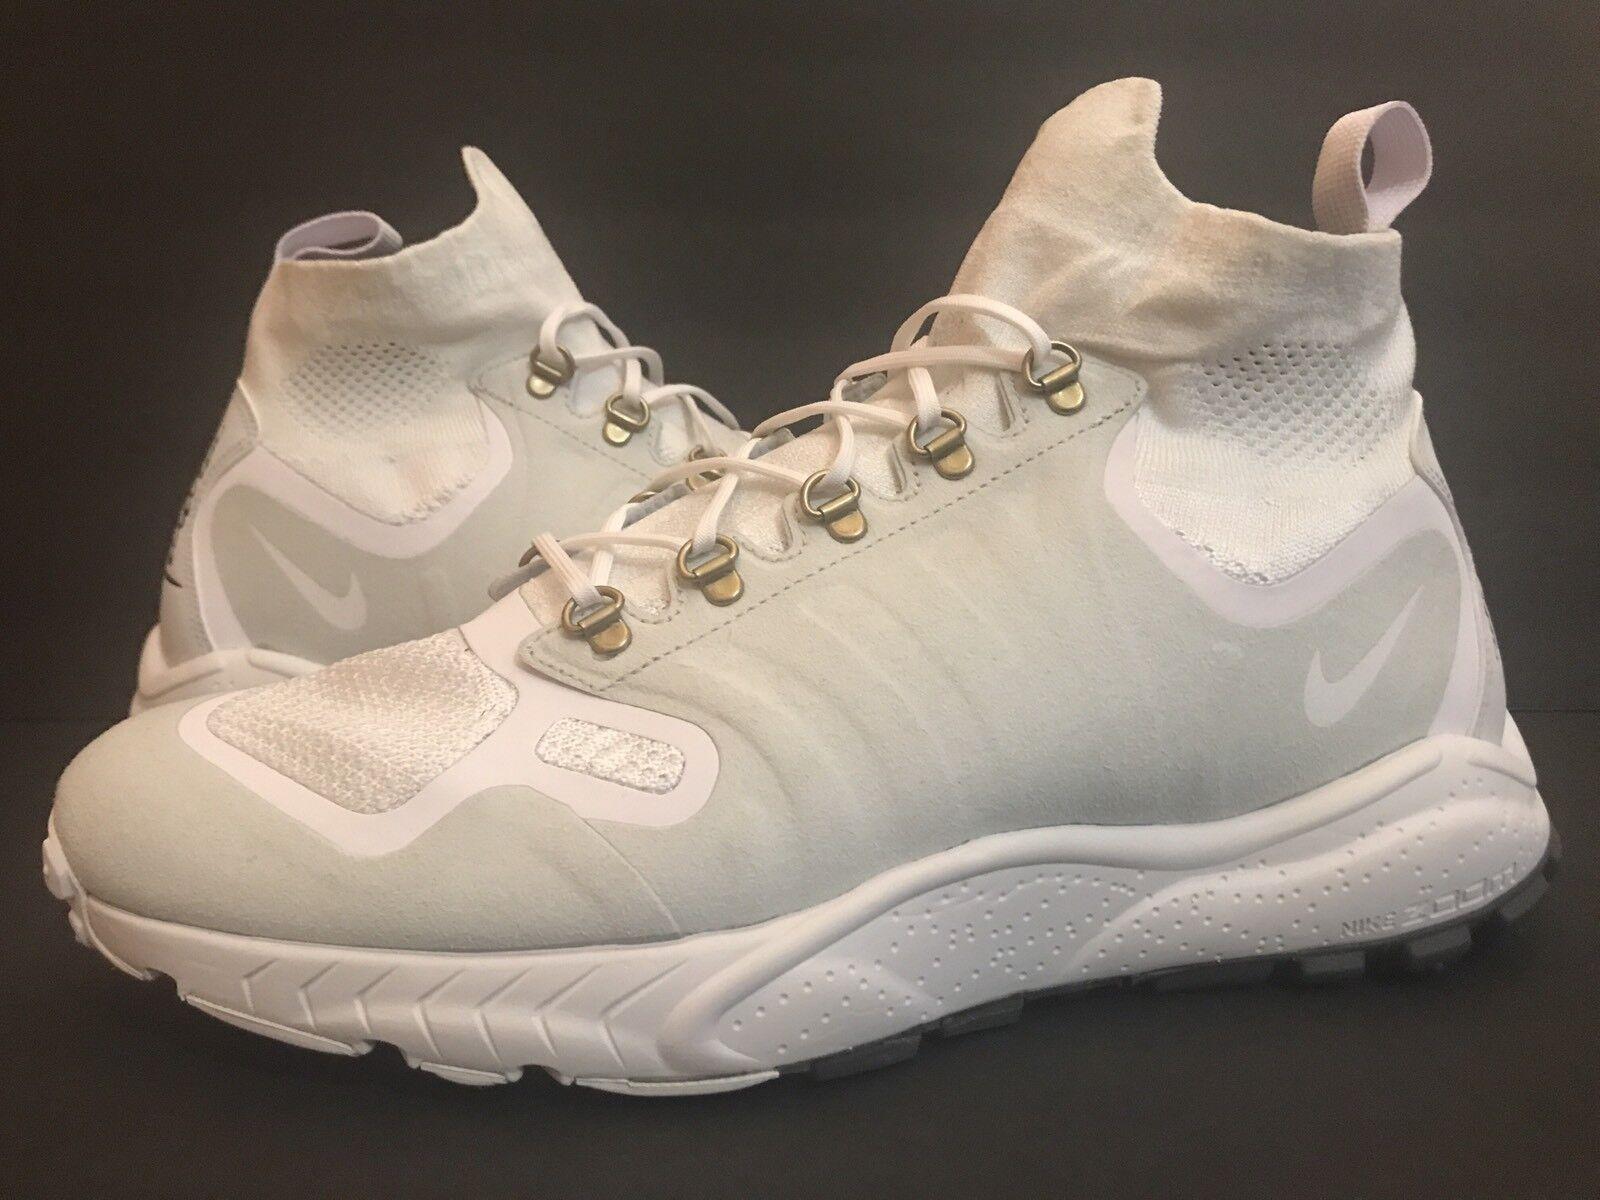 Nike Zoom TALARIA Mid FK MNS 856957-100 White PurePlatinum Trainer Sz 10